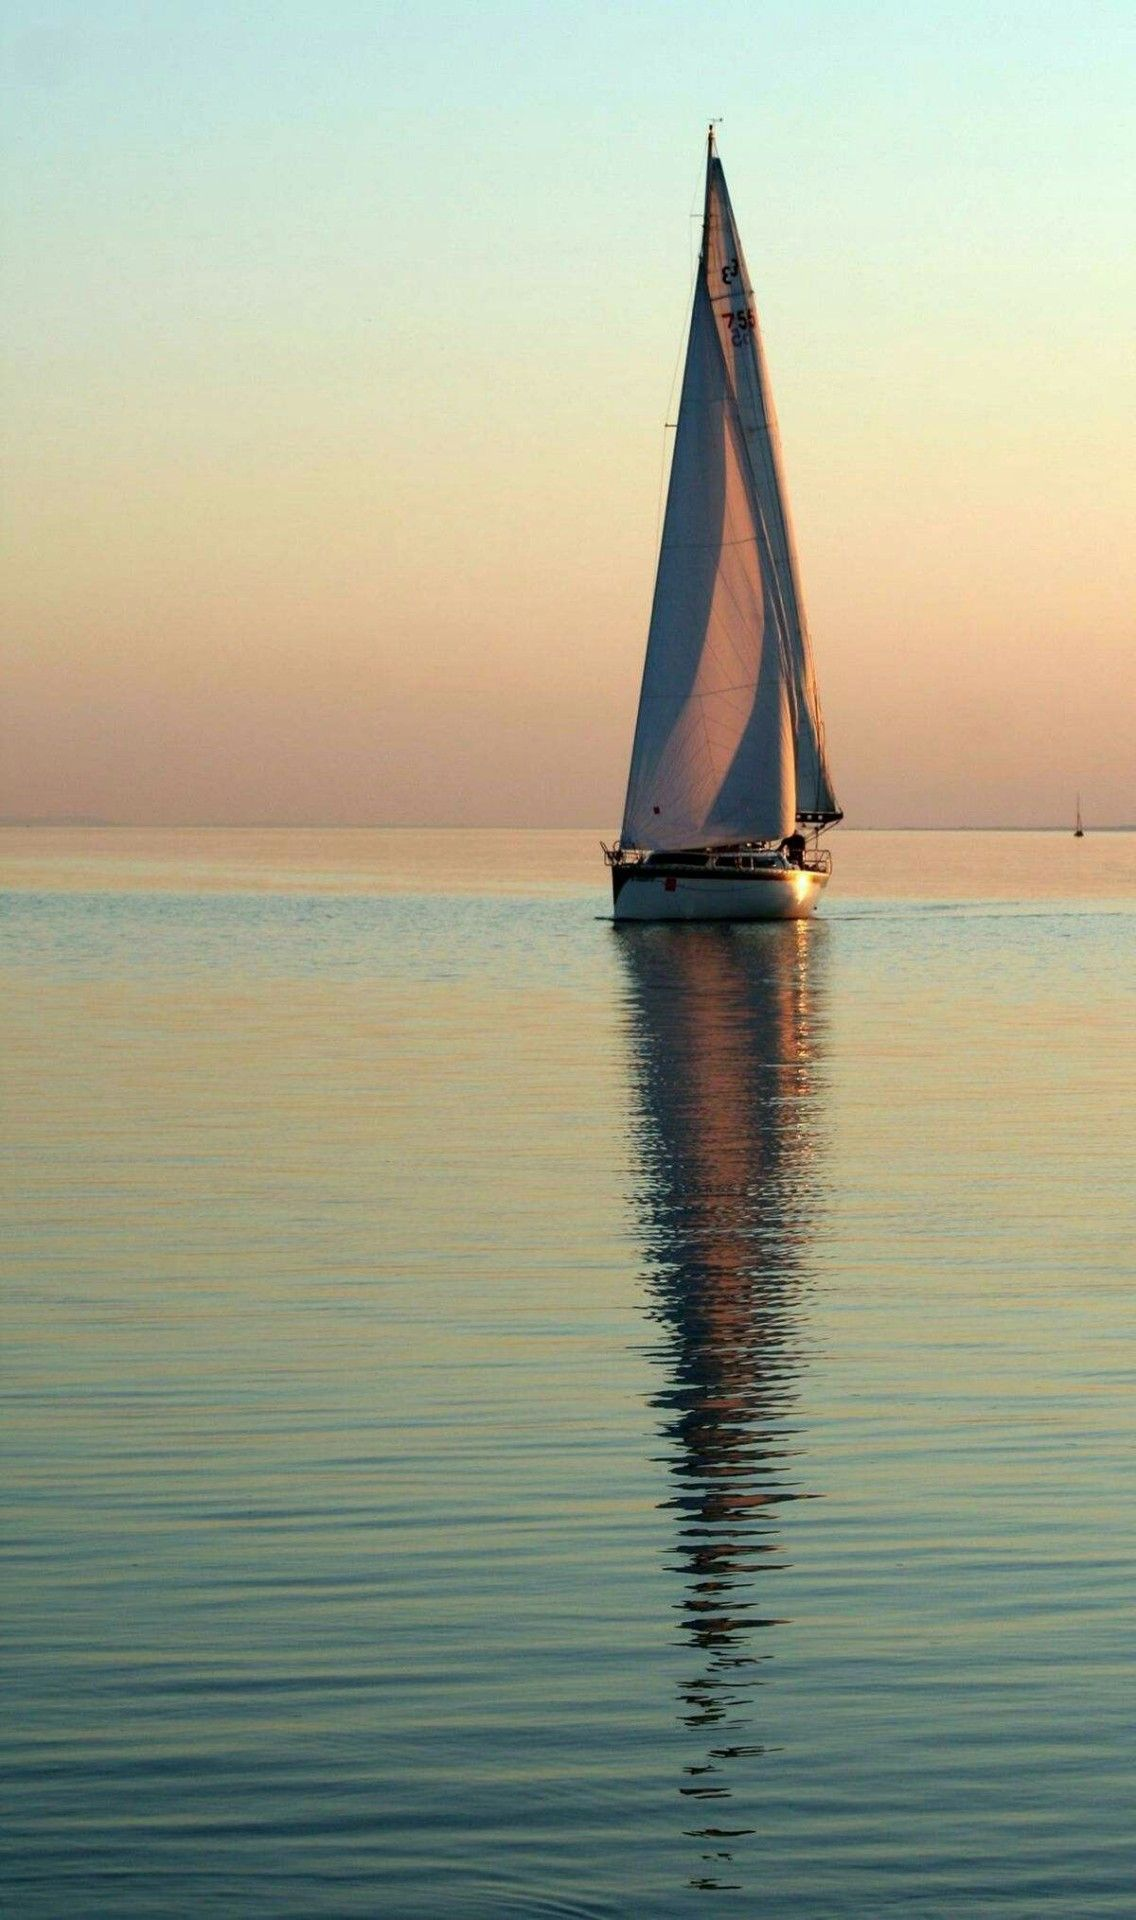 Pin On Coastal Moon boat sunset sail evening lake